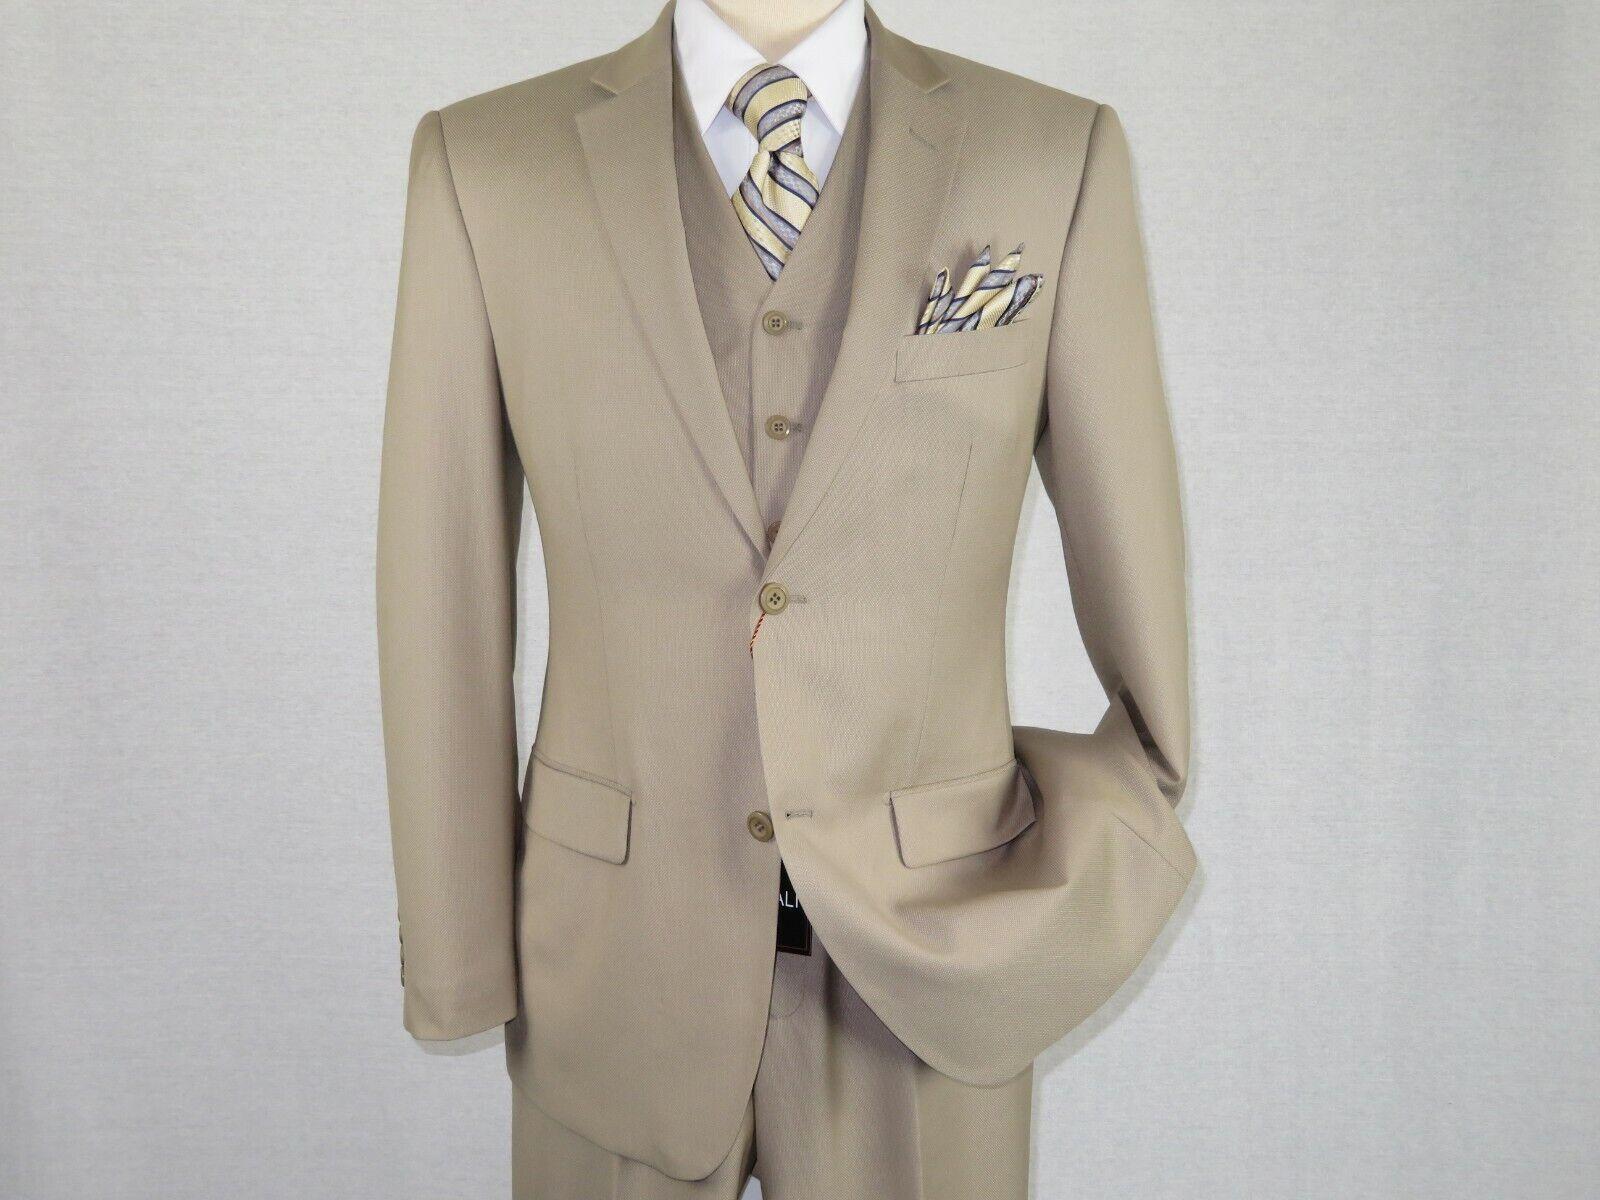 Men Suit Vitali Three Piece Vested English Nailhead pin dot M1481 Beige Ecru new